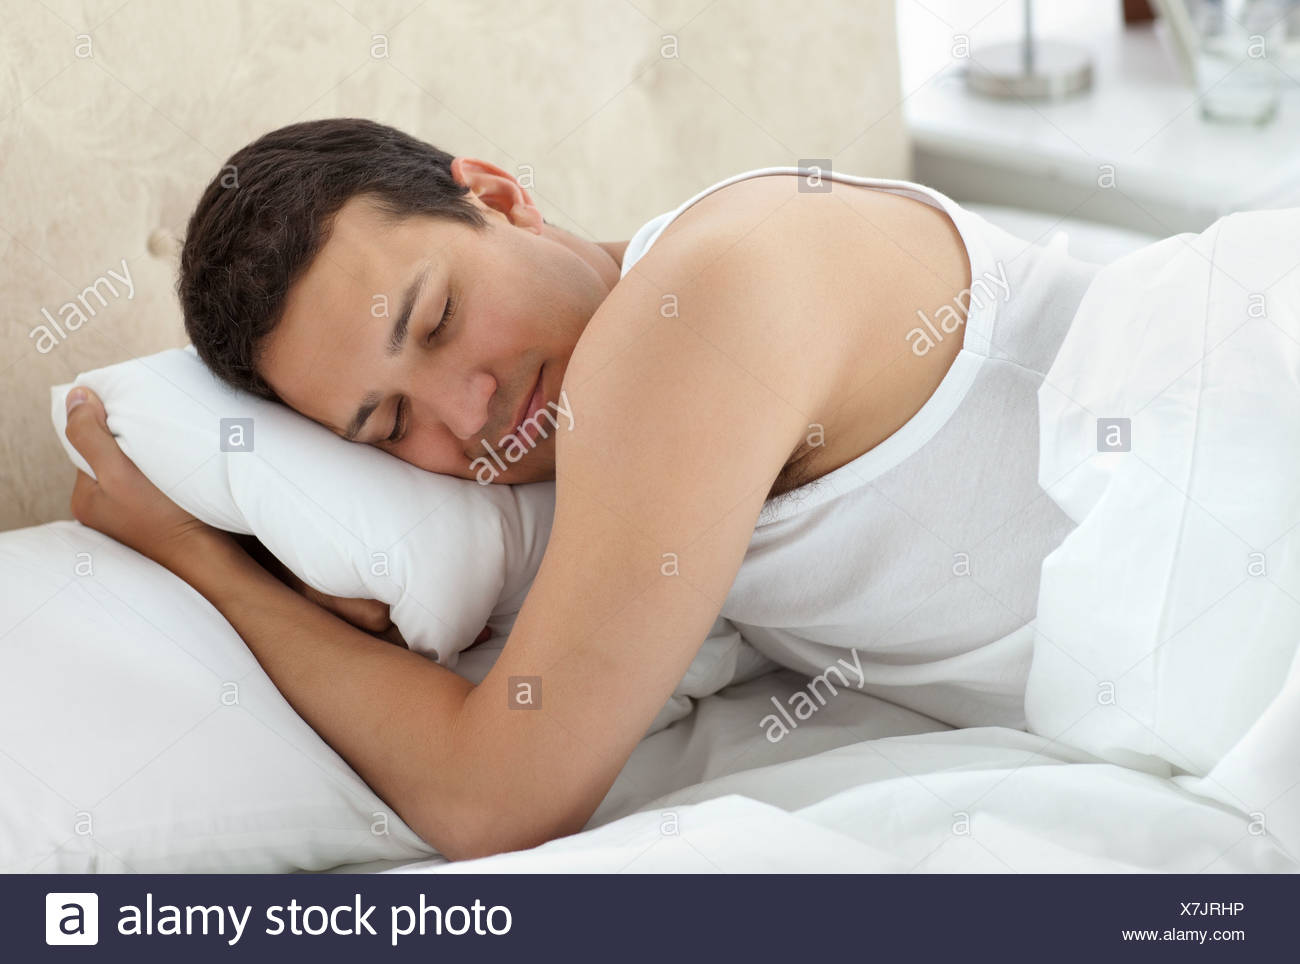 Netten Mann friedlich schlafend in seinem Bett Stockbild